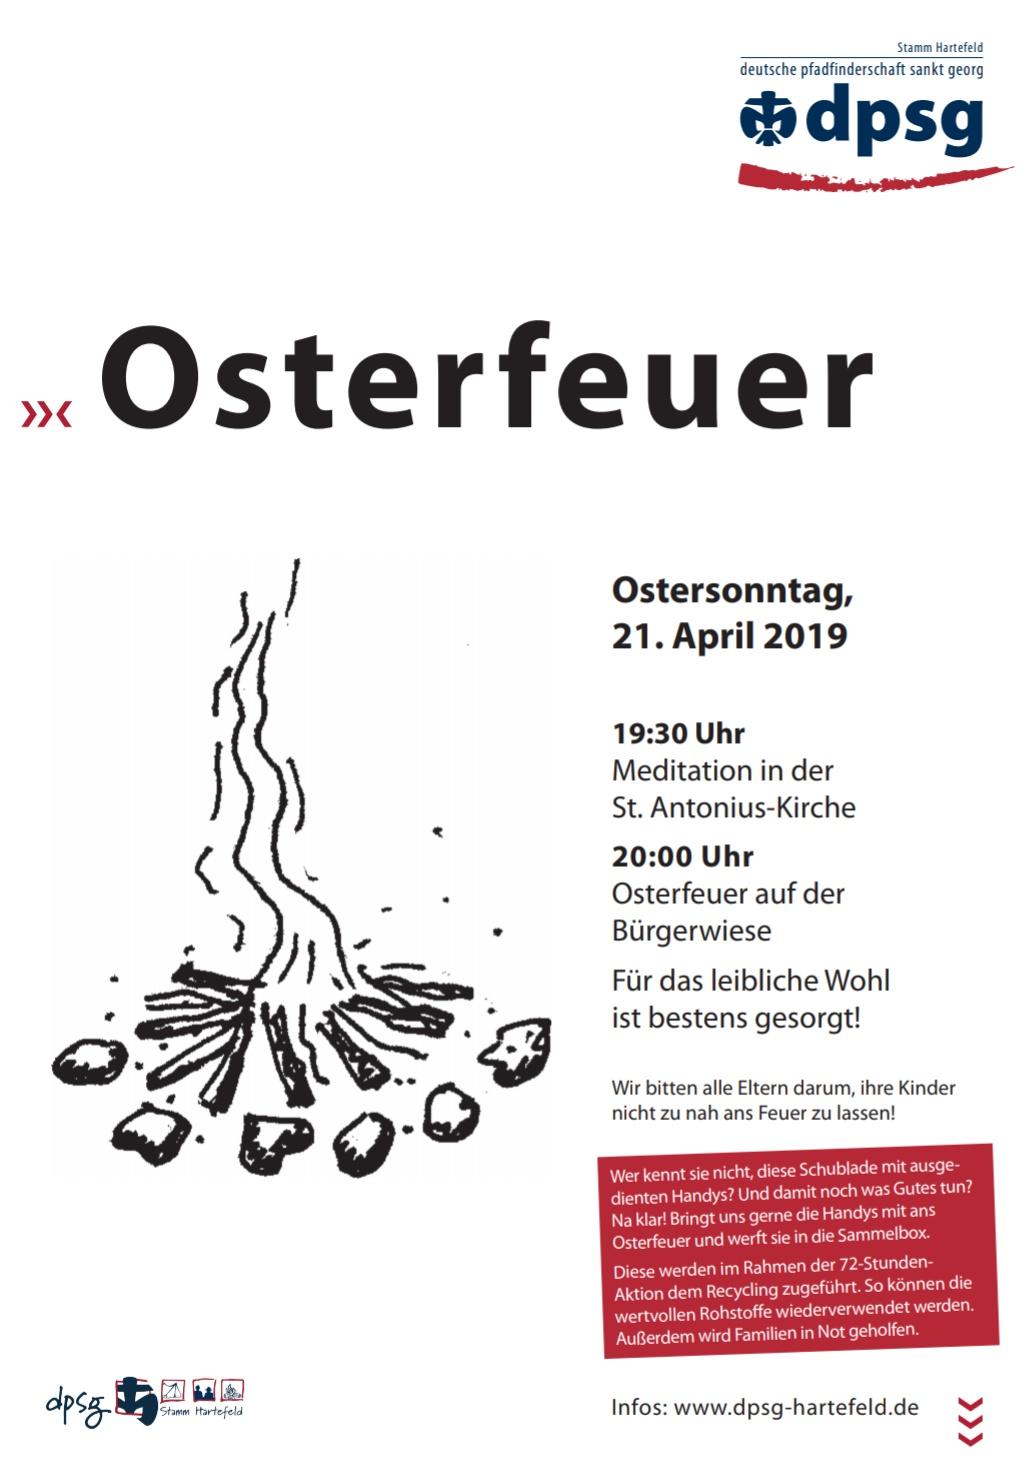 Osterfeuer 2019 Hartefeld